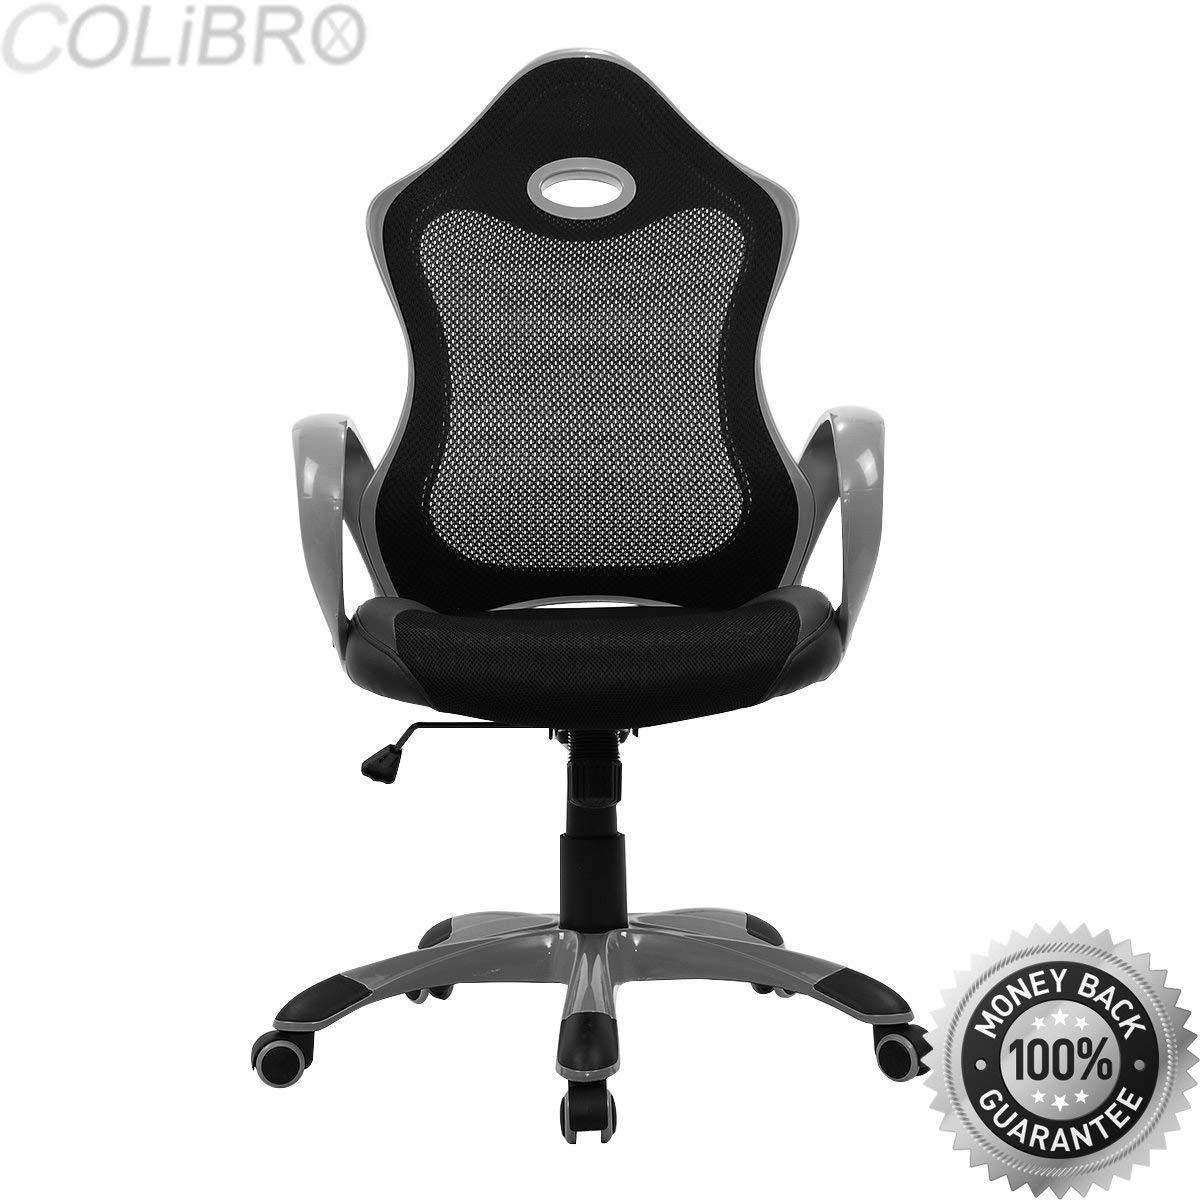 COLIBROX--New Ergonomic Mesh High Back Executive Modern Computer Desk Task Office Chair. high back mesh ergonomic computer desk office chair.amazon stylish ergonomic office chair.best office chair.